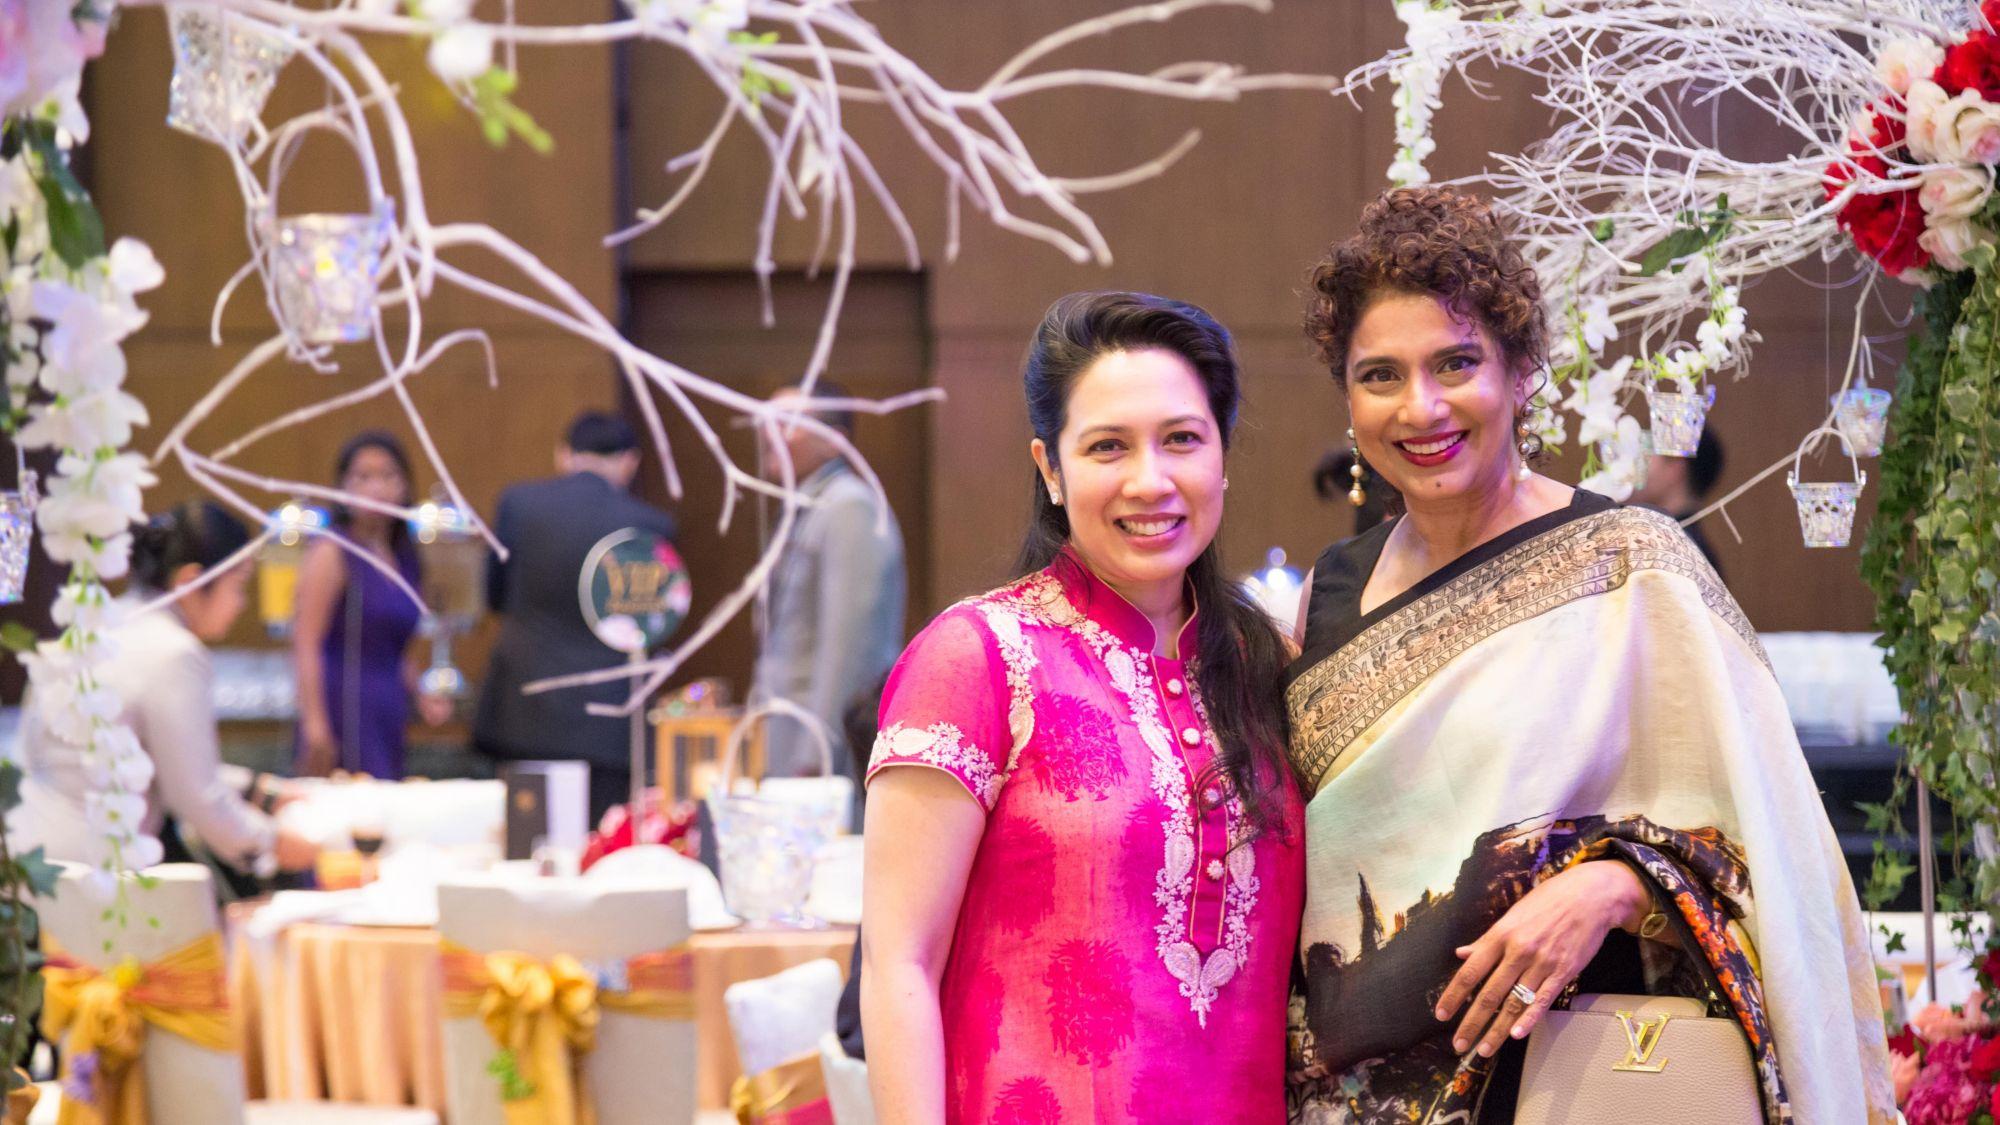 Datin Sunita Rajkumar and Ria Thomas